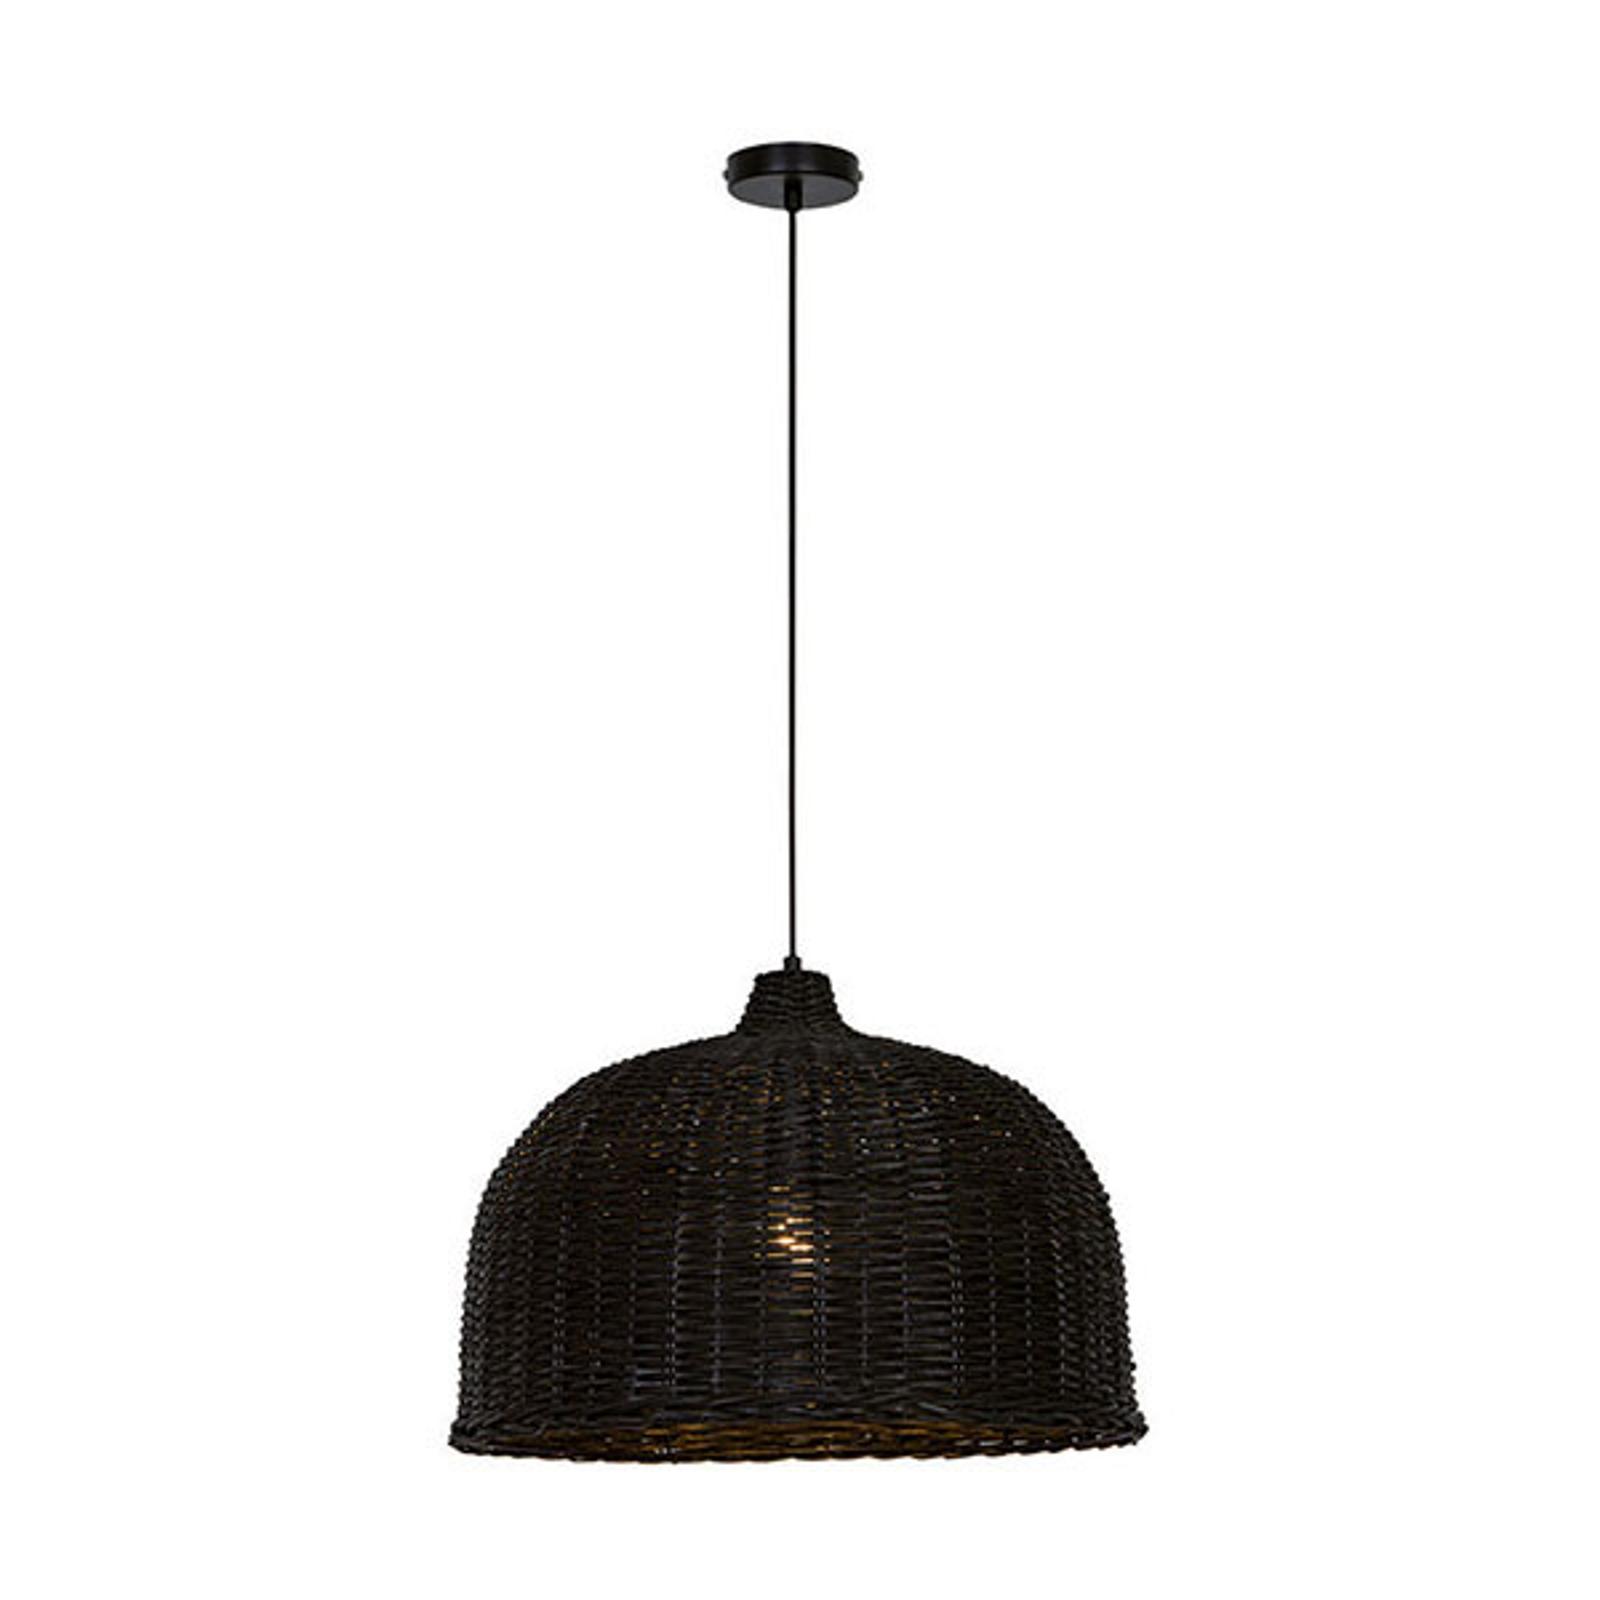 Hanglamp Malibu van hout, zwart